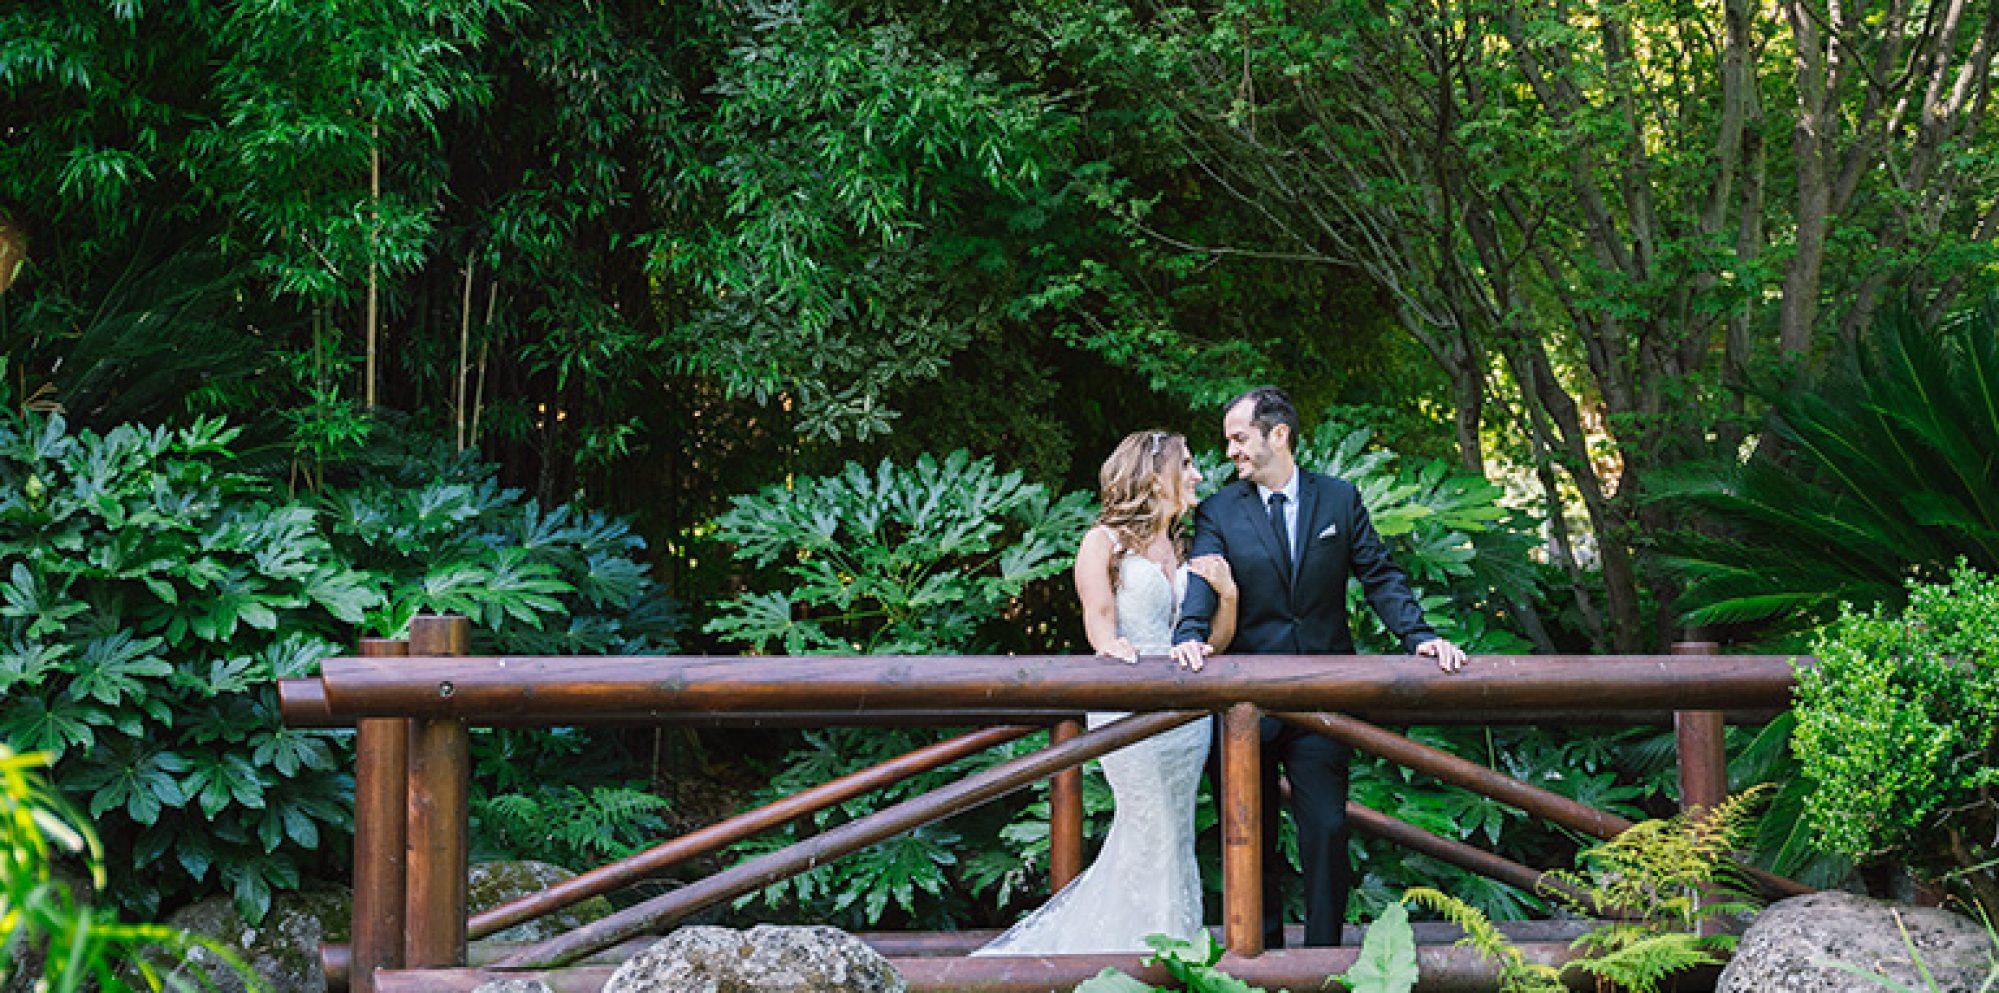 Issac & sharon wedding photography